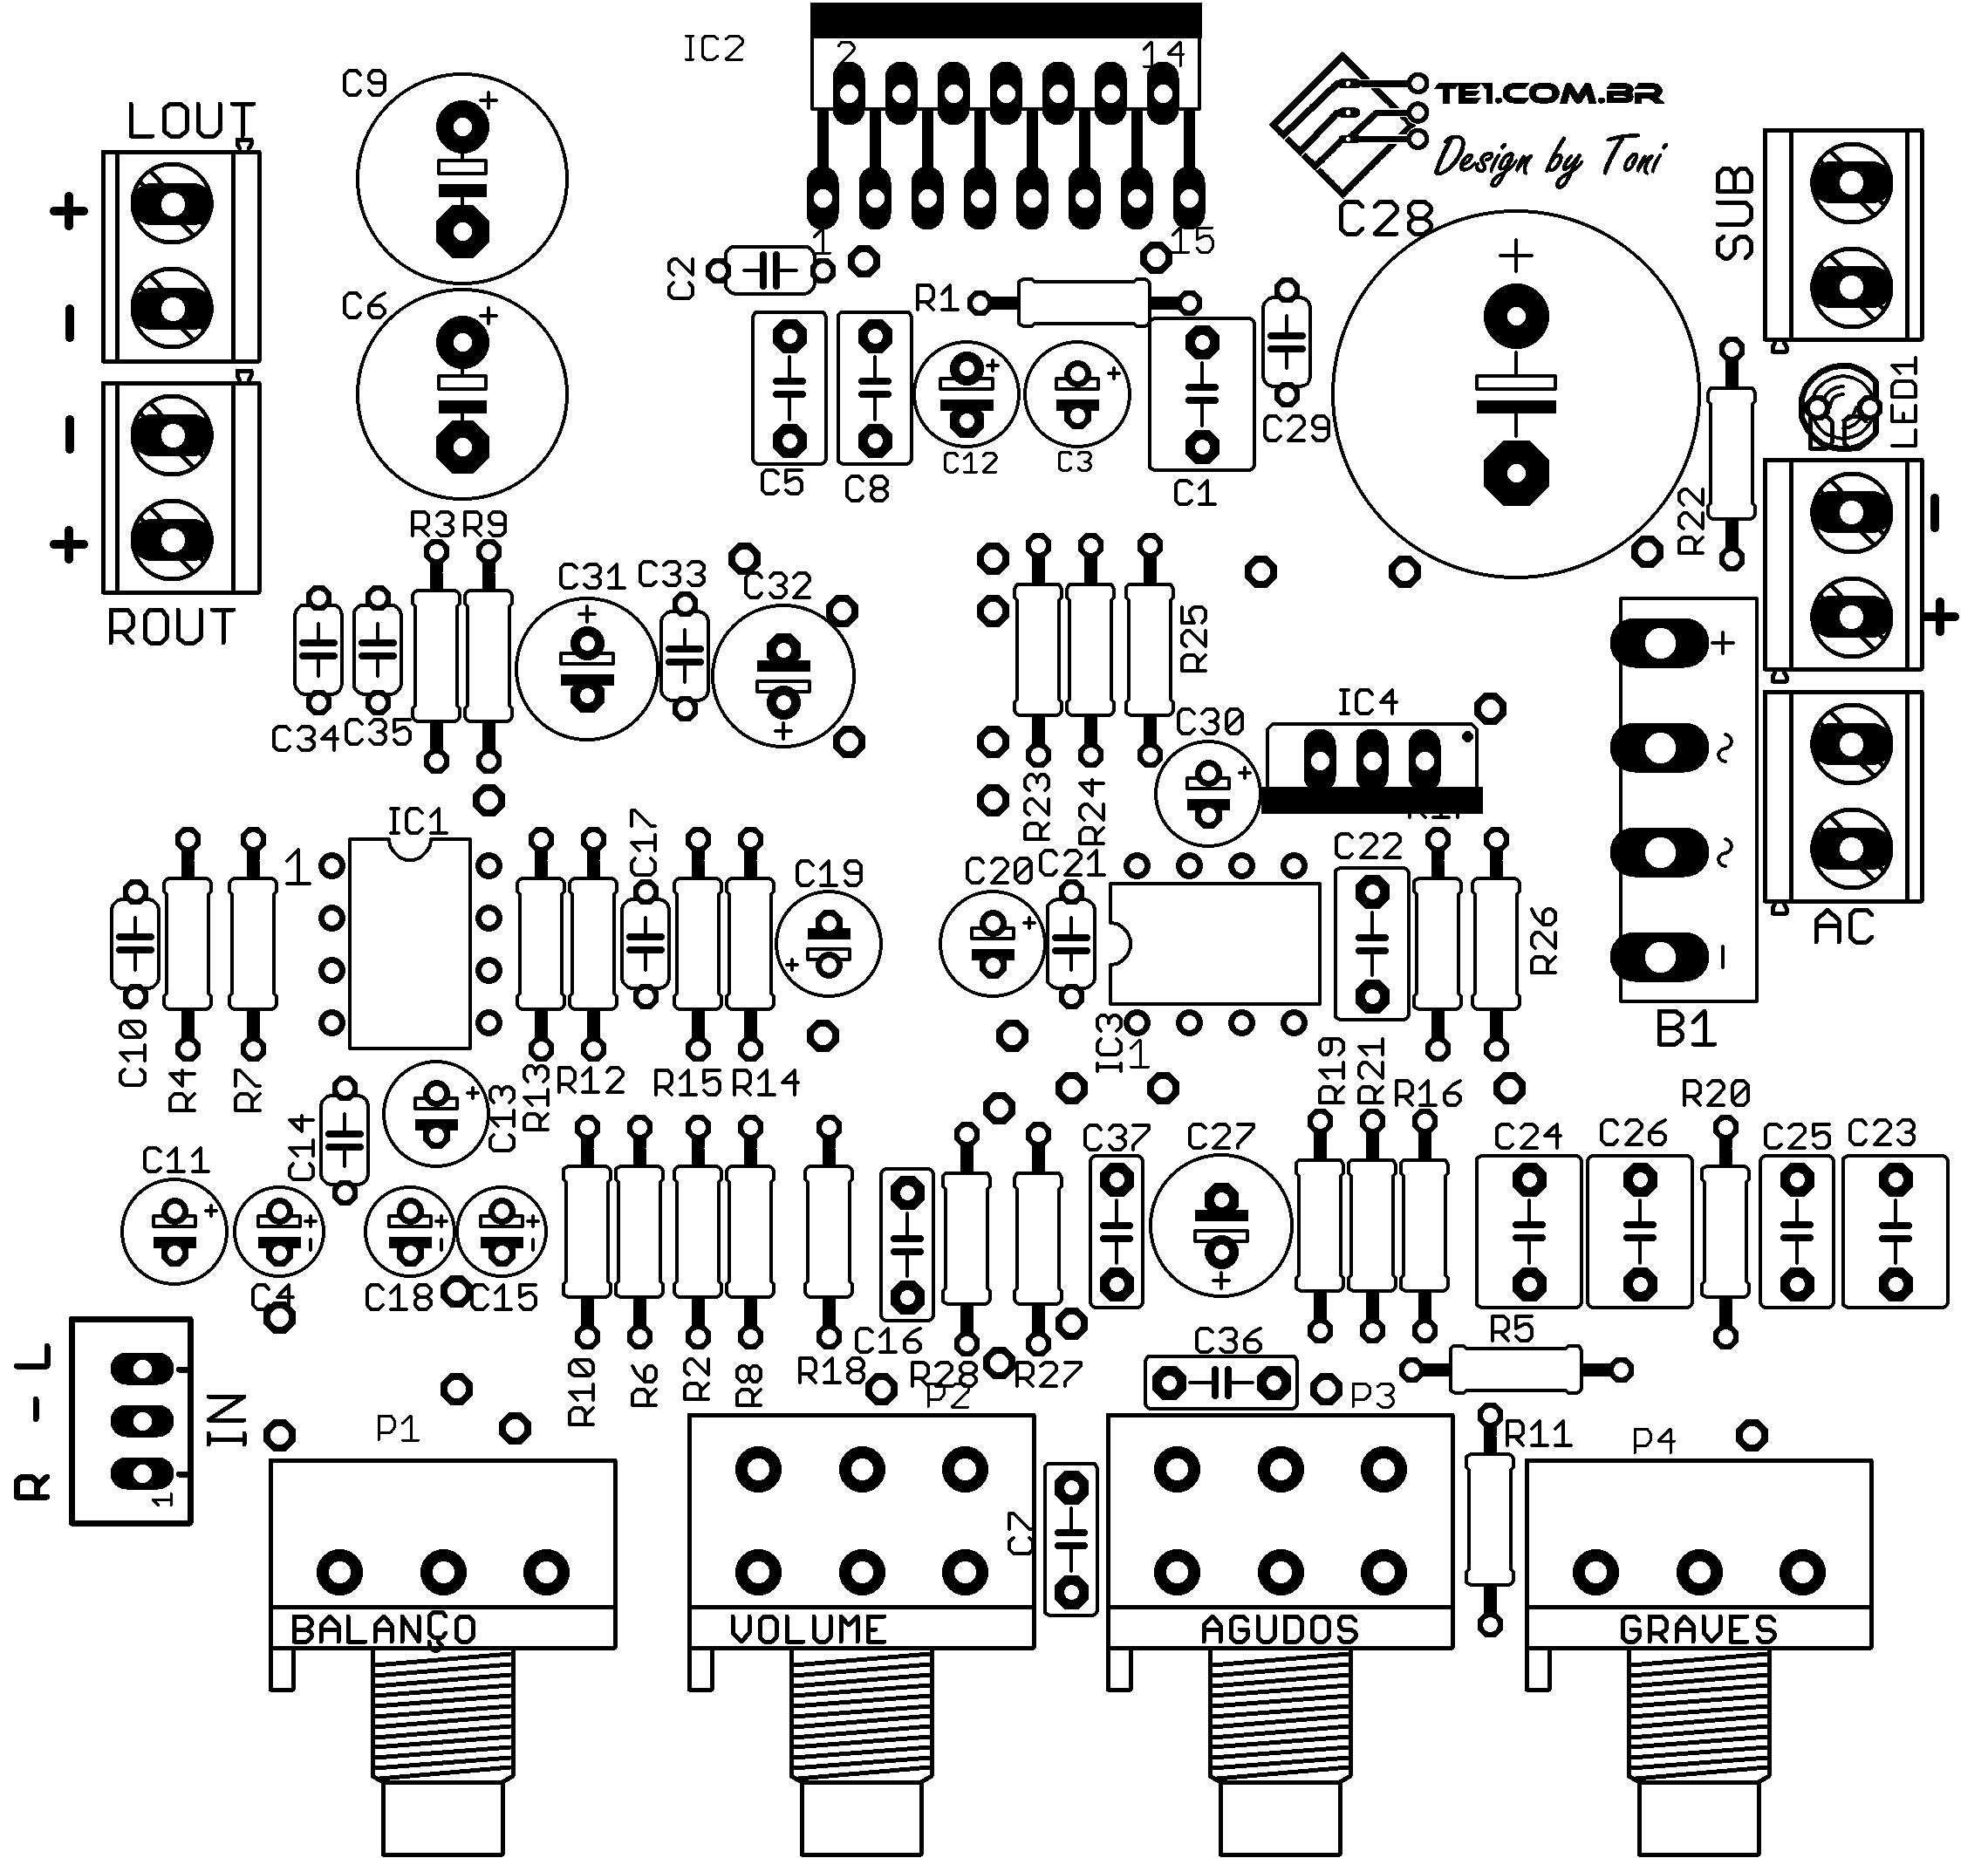 circuit diagram image  amplificador 21 com integrado tda7377 subwoofer toni  eletronica one